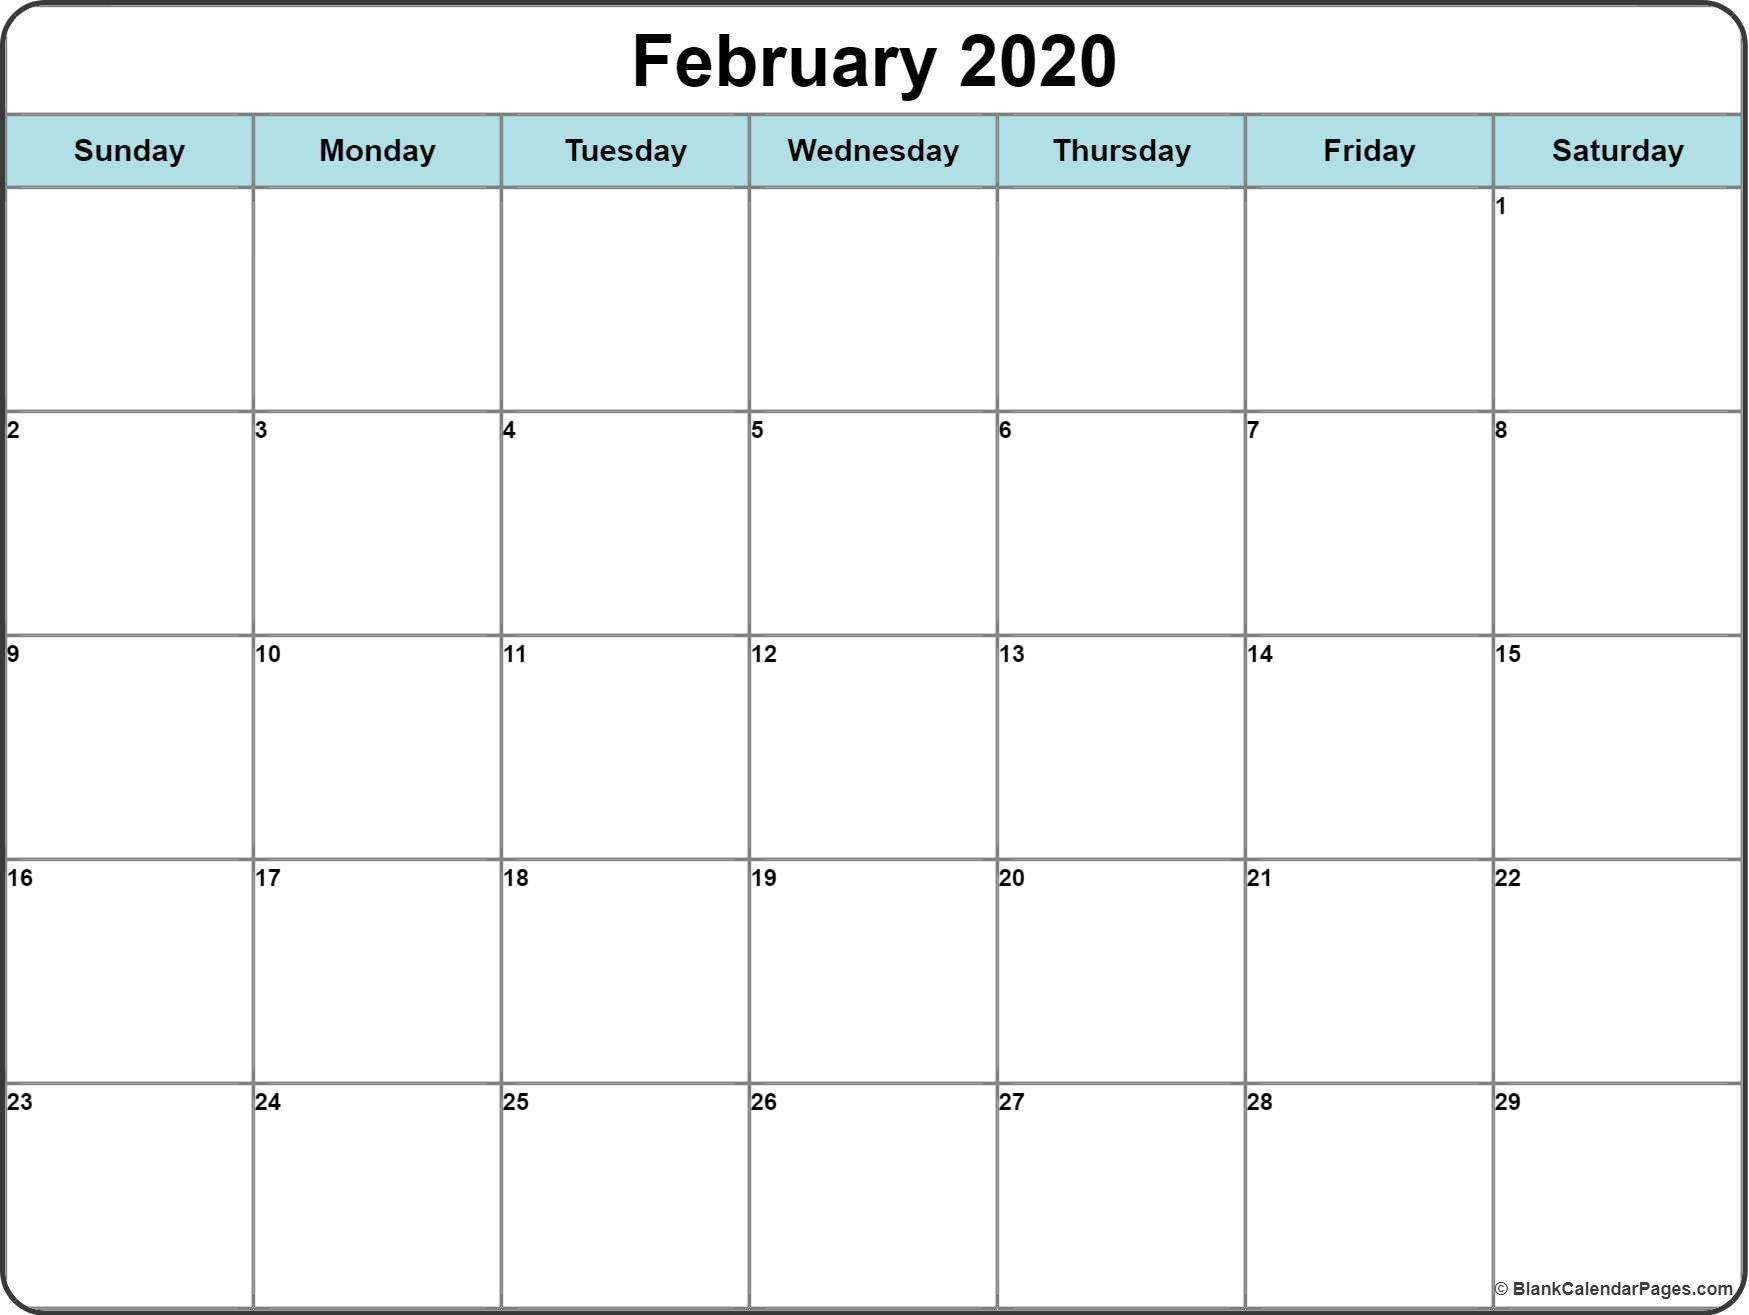 February 2020 Printable Calendar Template #2020Calendars Remarkable 2020 Blank Printable Monthly Template